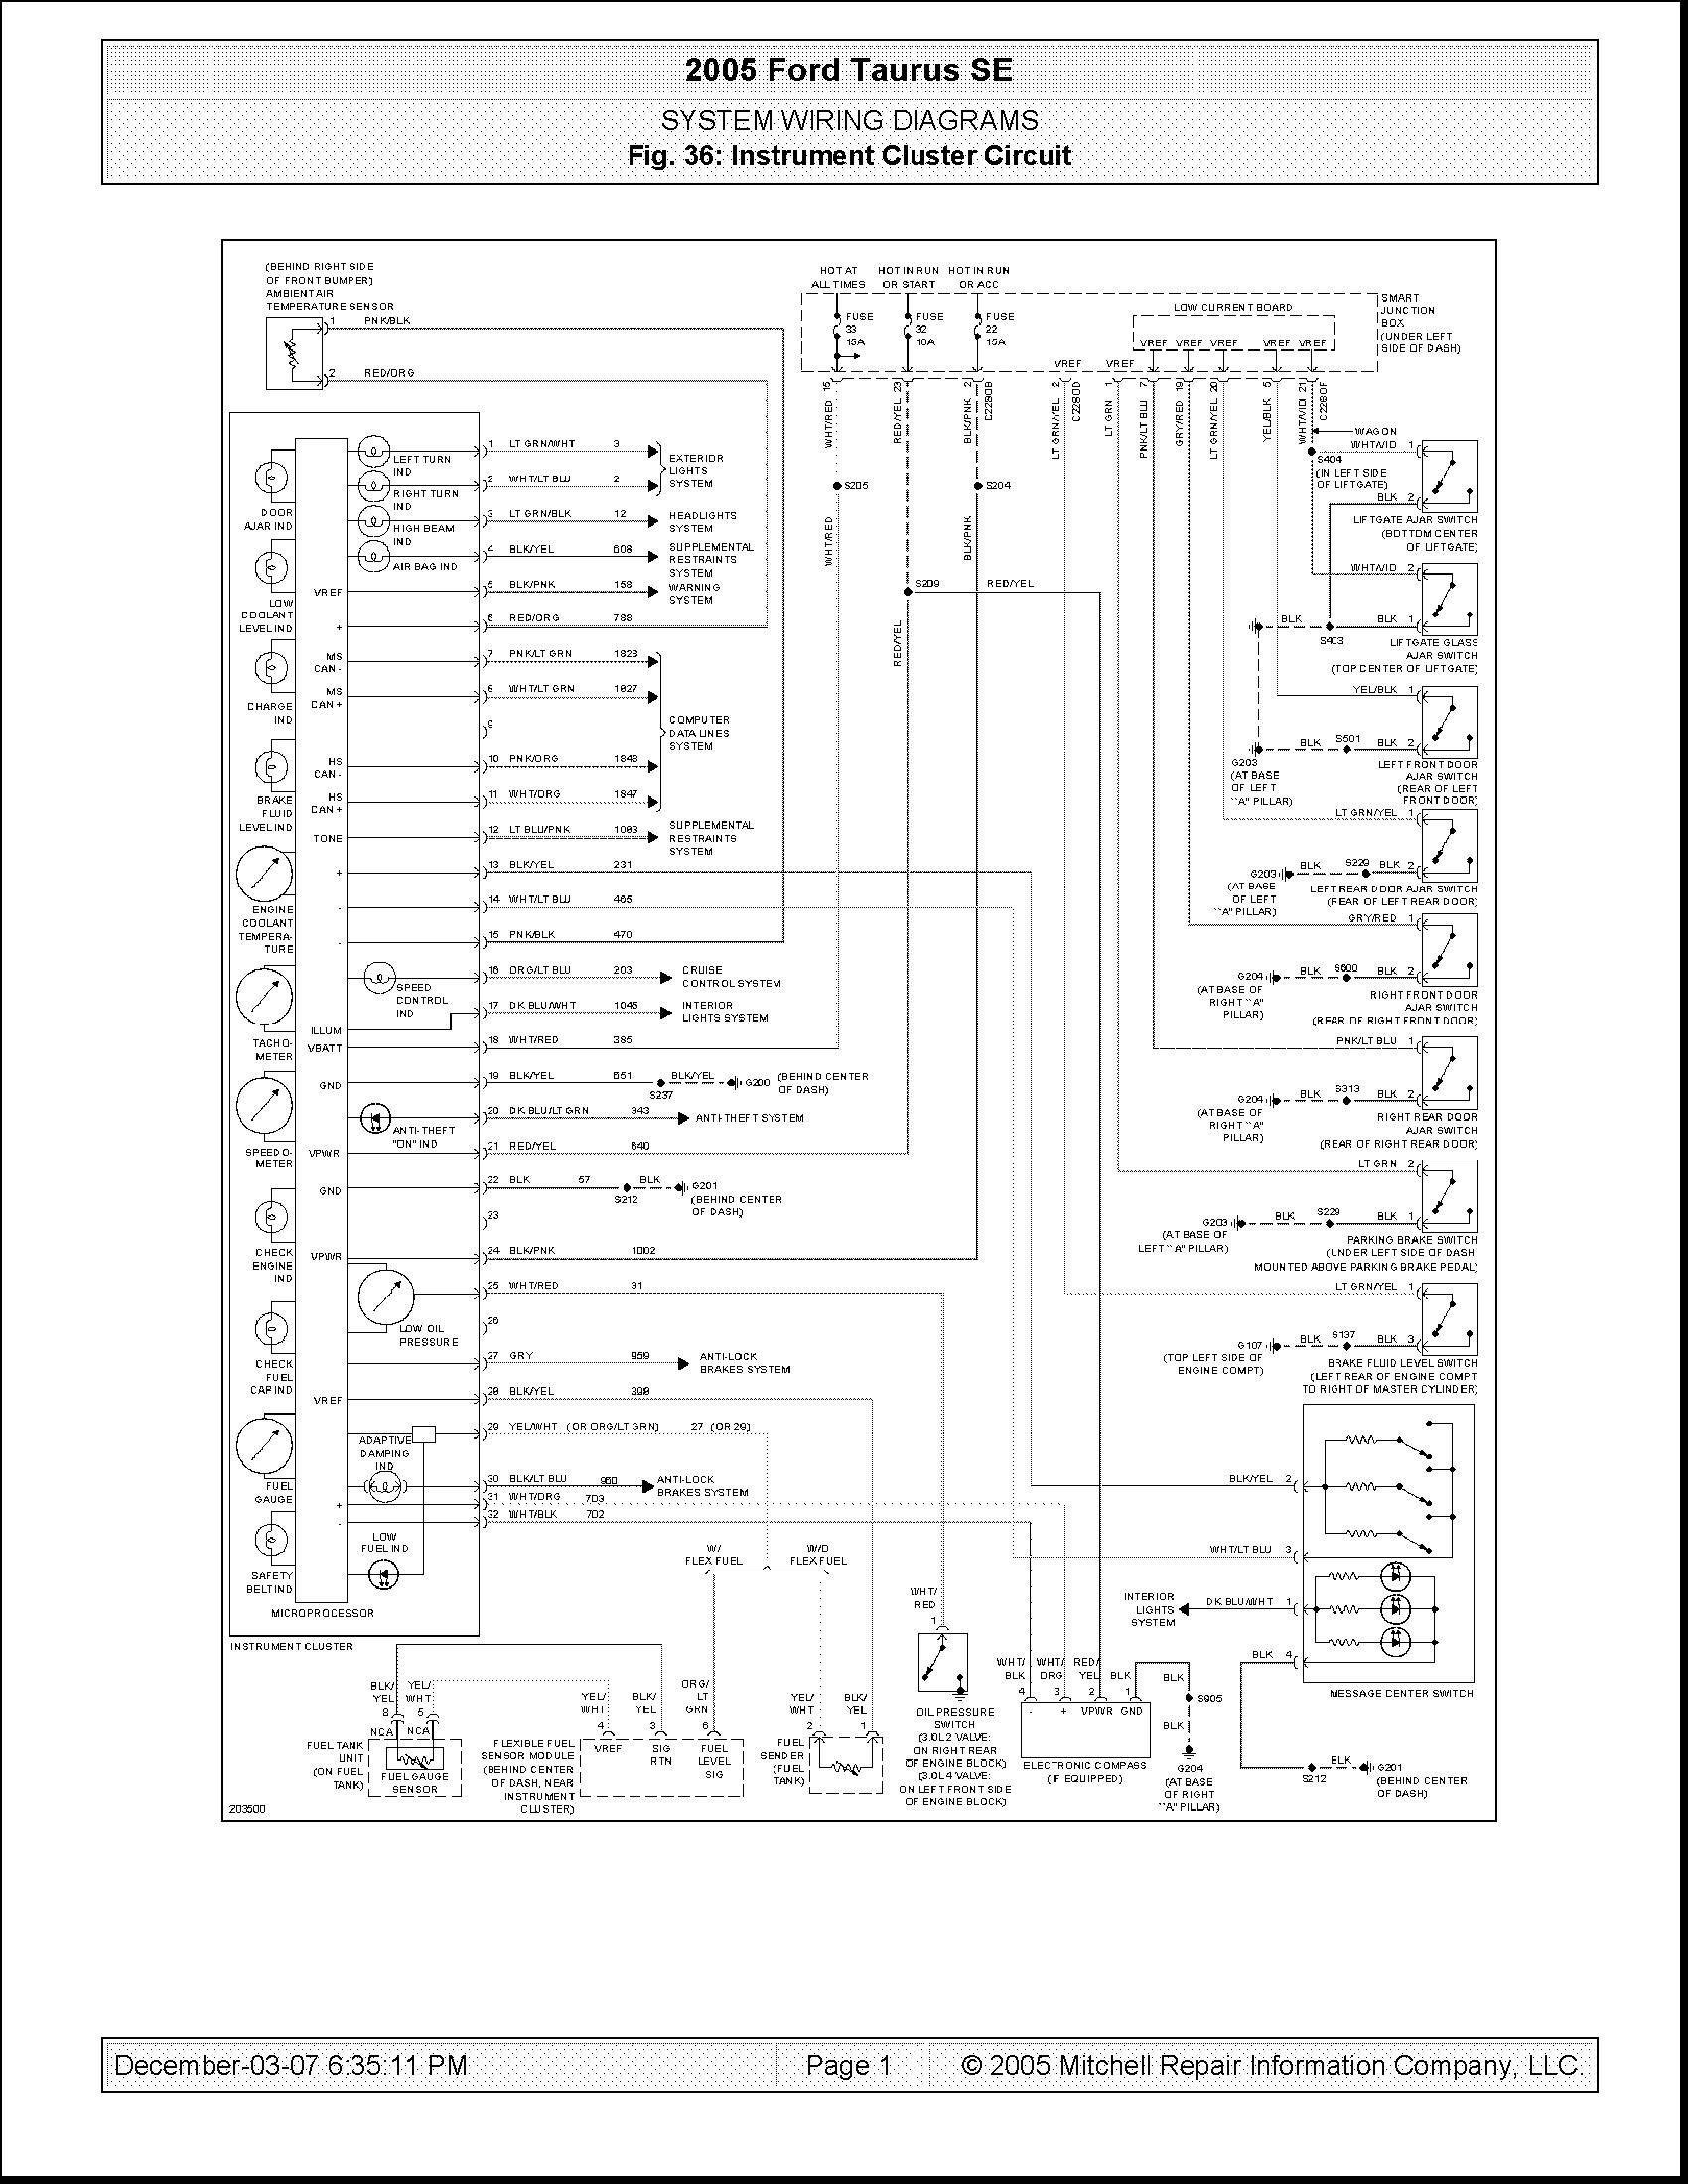 1998 Mercury Sable Engine Diagram 1998 Mercury Sable Wiring Diagram Worksheet and Wiring Diagram • Of 1998 Mercury Sable Engine Diagram